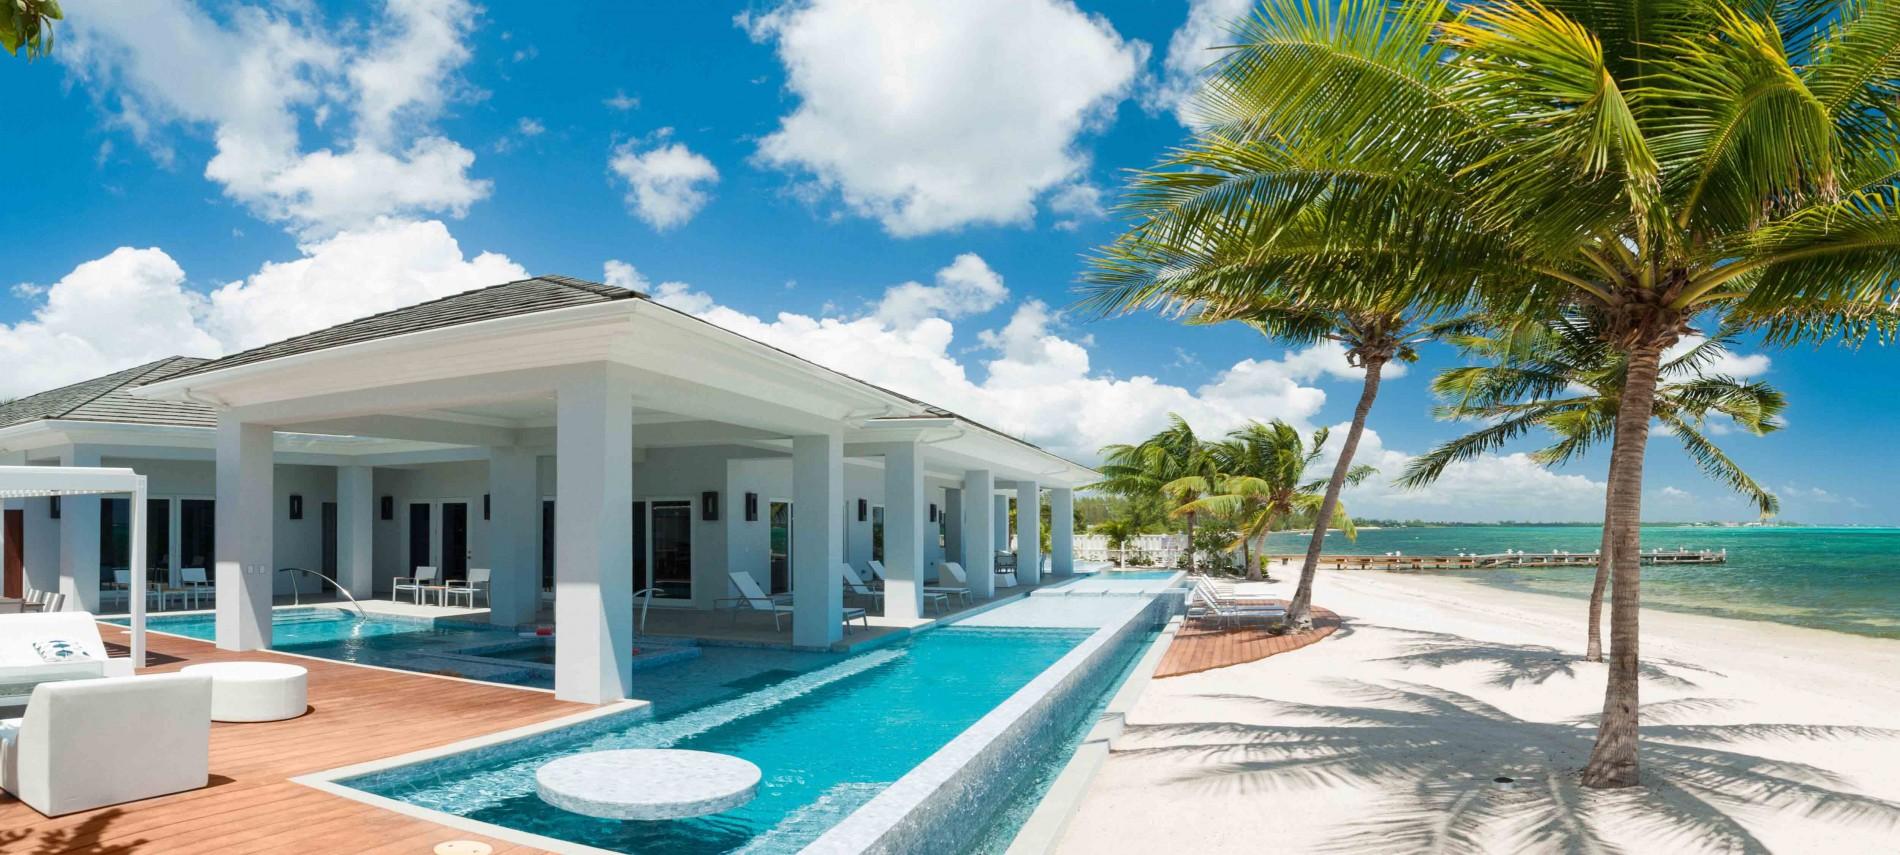 Grand Cayman Villas >> Point Of View Cayman Islands Luxury Villa Cayman Islands